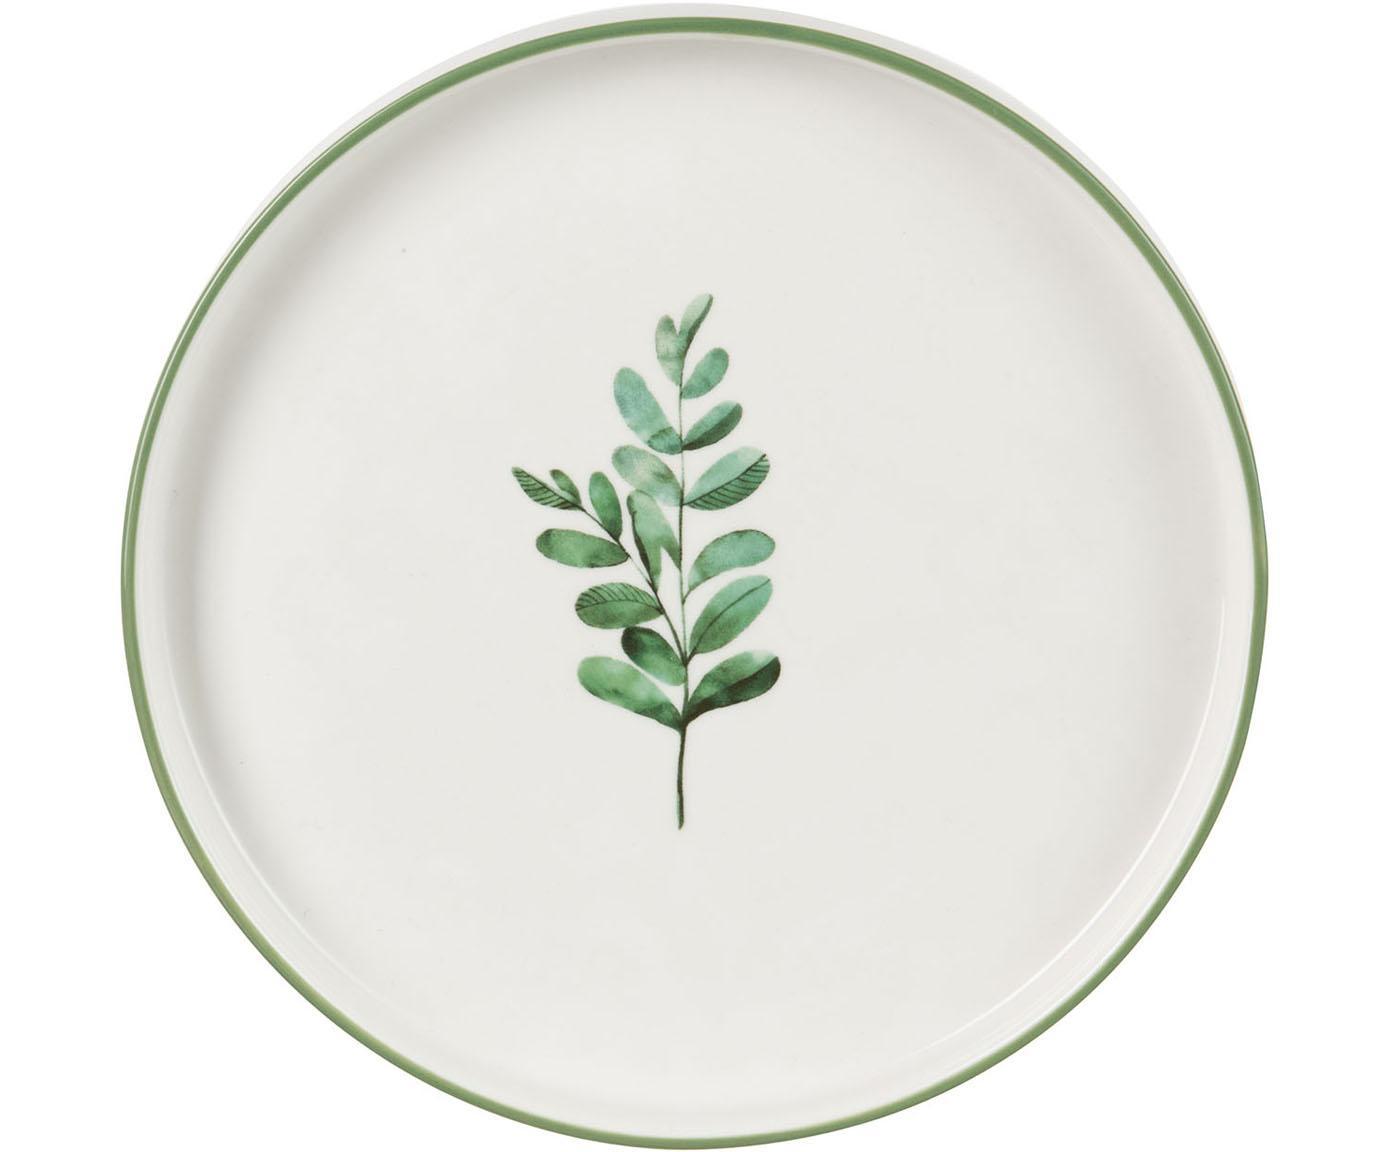 Frühstücksteller Eukalyptus, 4 Stück, New Bone China, Weiß, Grün, Ø 24 cm